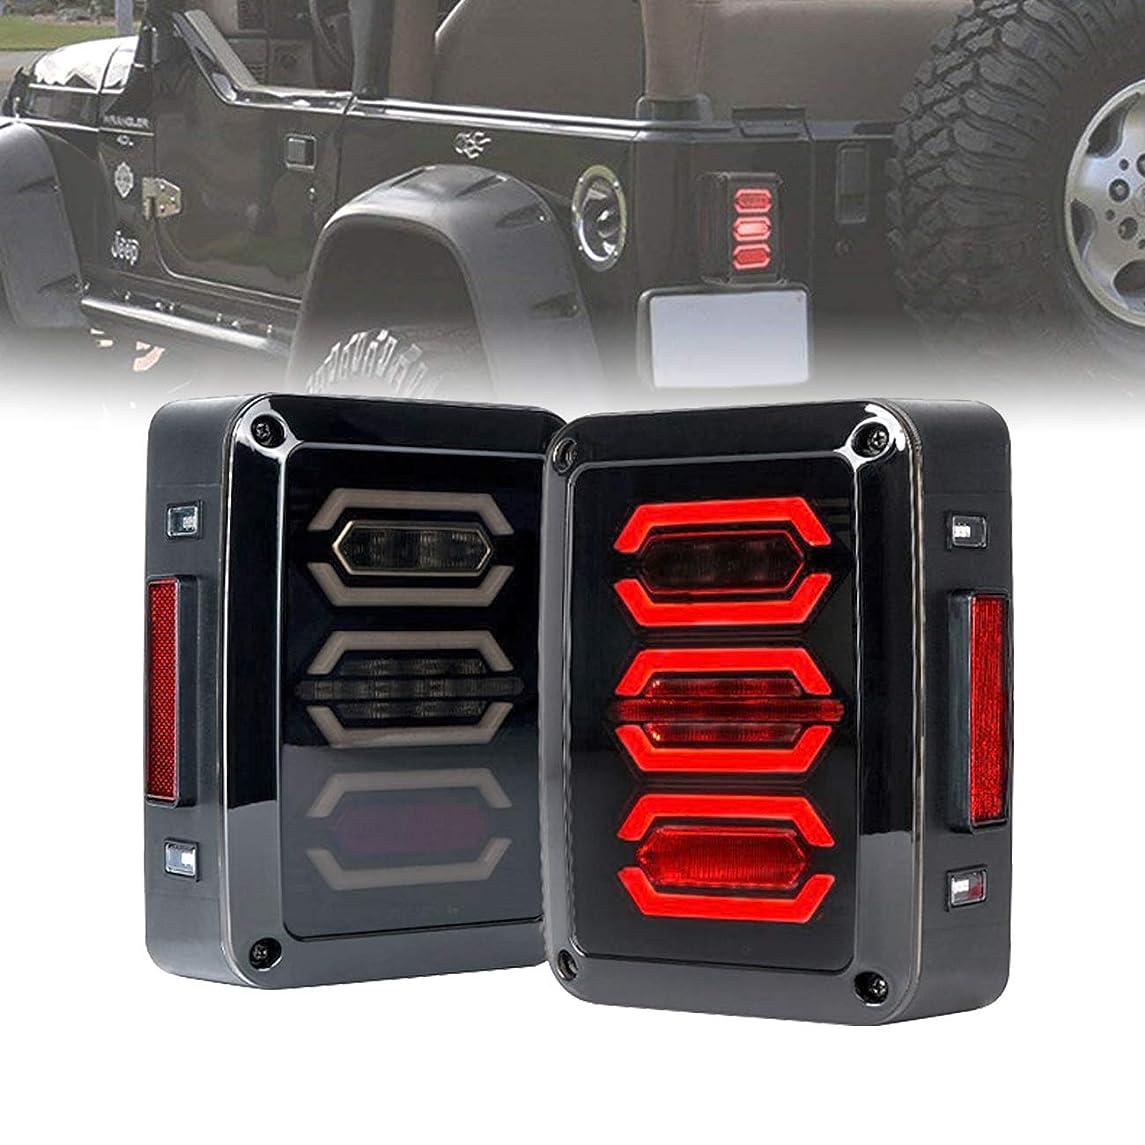 ICARS 2007-2018 Jeep Wrangler JK JKU Tail Lights Brake Lights LED Smoke Lens with Turn Signal Lights, Avenger Style - Pair